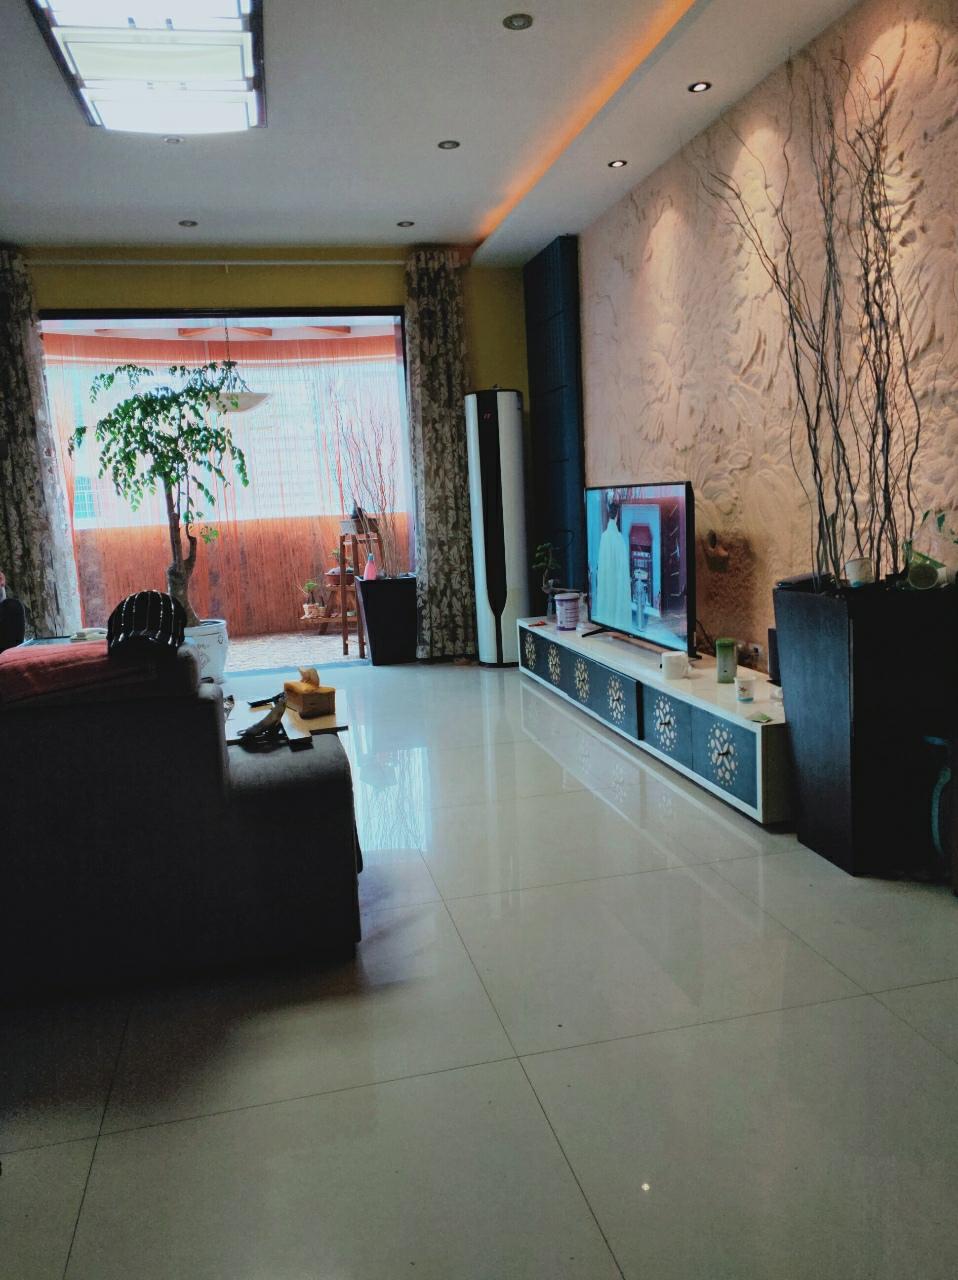 yabo88亚博体育app商业城五楼5室 2厅 2卫89.8万元